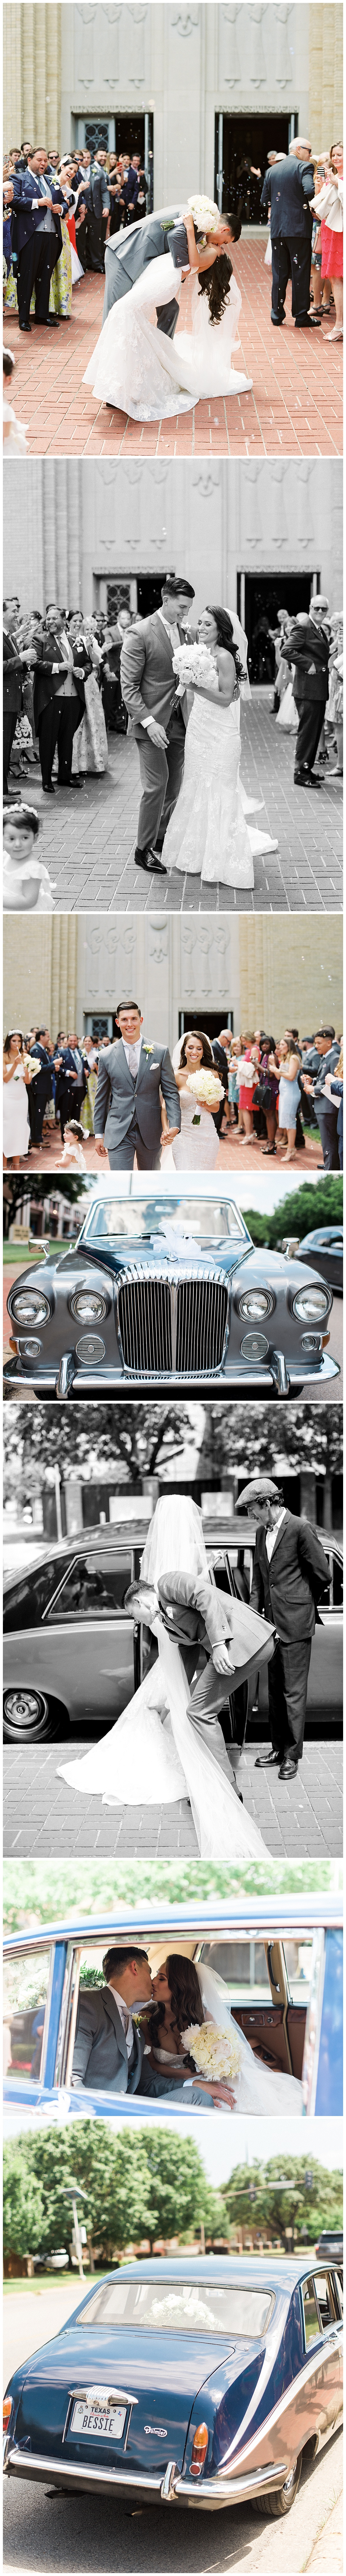 christ-the-king-catholic-church-wedding-ar-photography-7.jpg